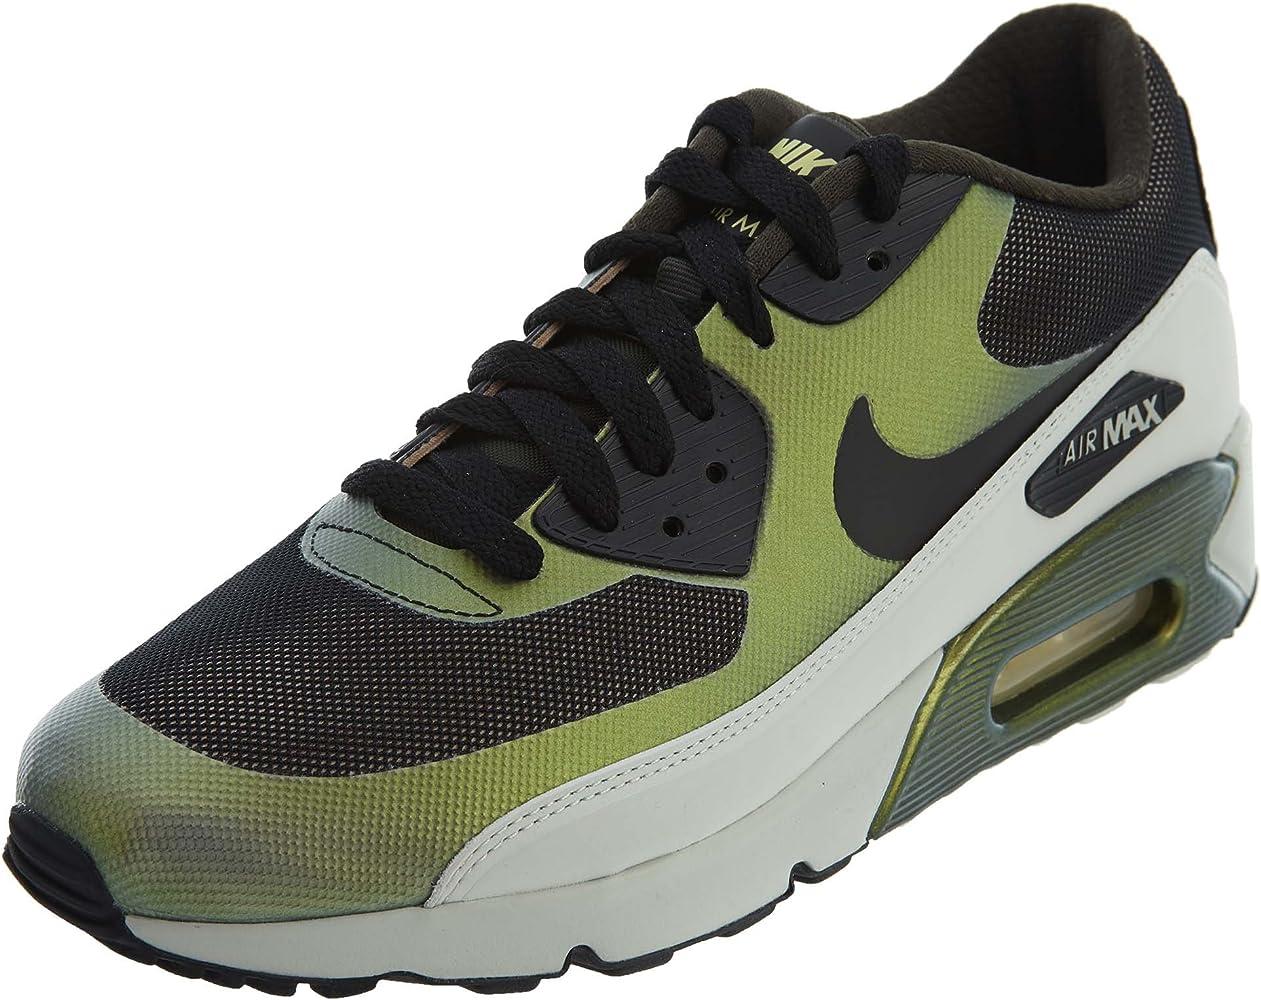 Nike Mens Air Max 90 Ultra 2.0 SE Running Shoes Pale Citron/Black/Bio Beige 876005-700 Size